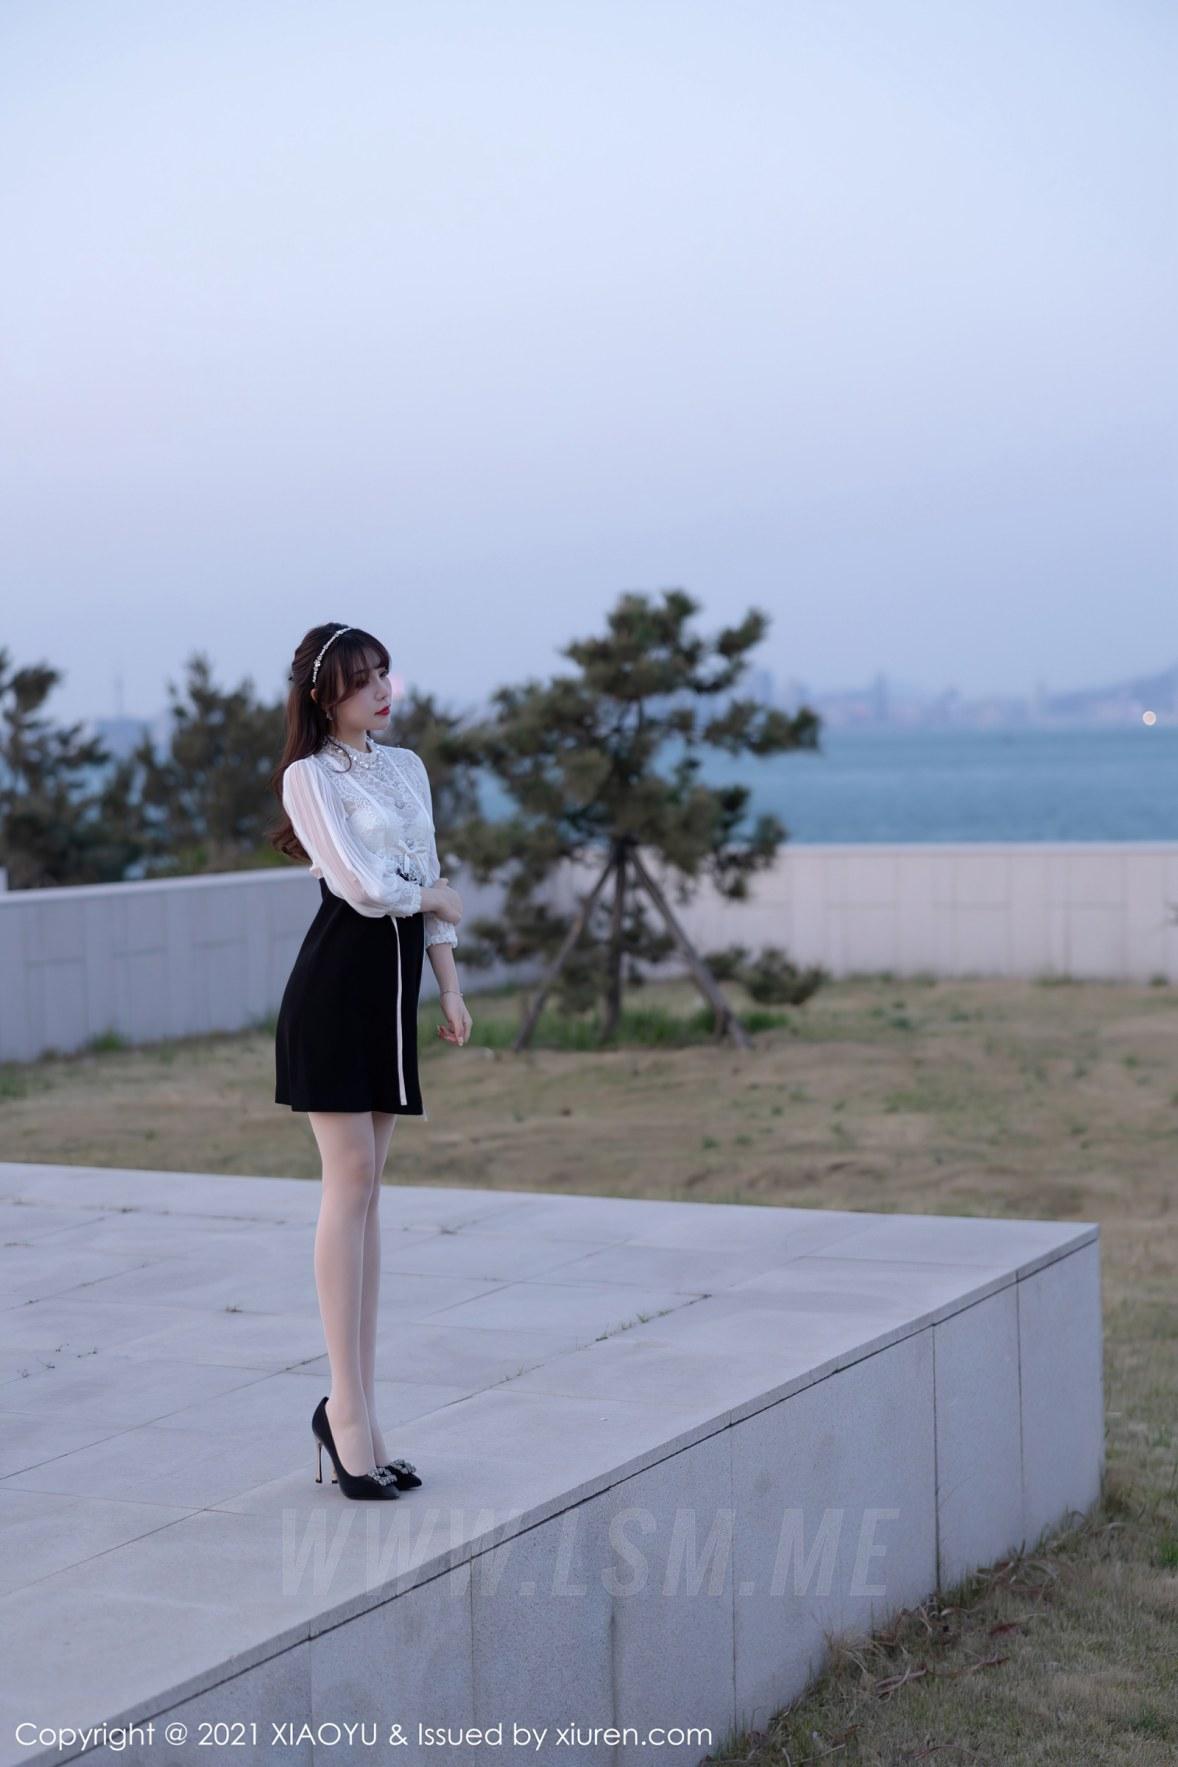 XIAOYU  语画界 Vol.534 都市OL服饰 芝芝Booty 青岛旅拍写真 - 2